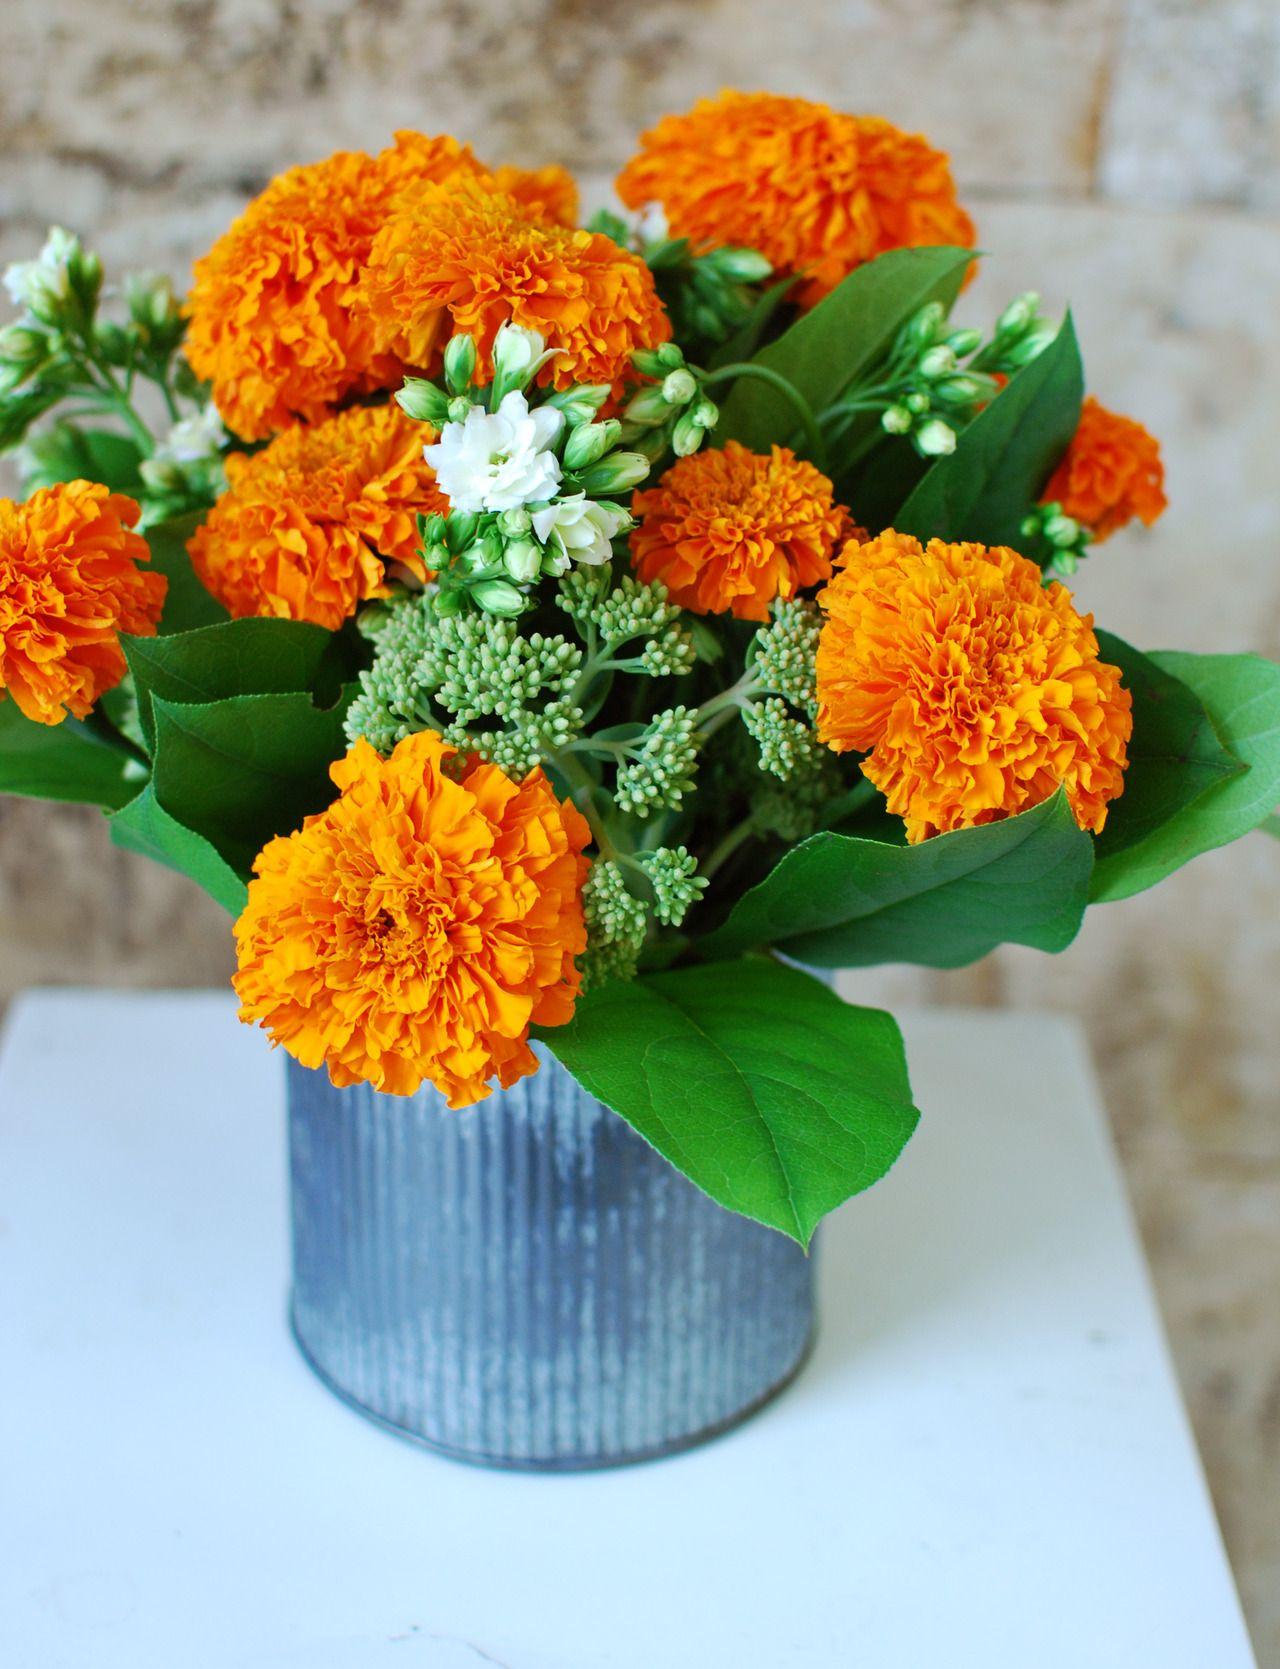 Marigolds kitschy or cute flower arrangements centre